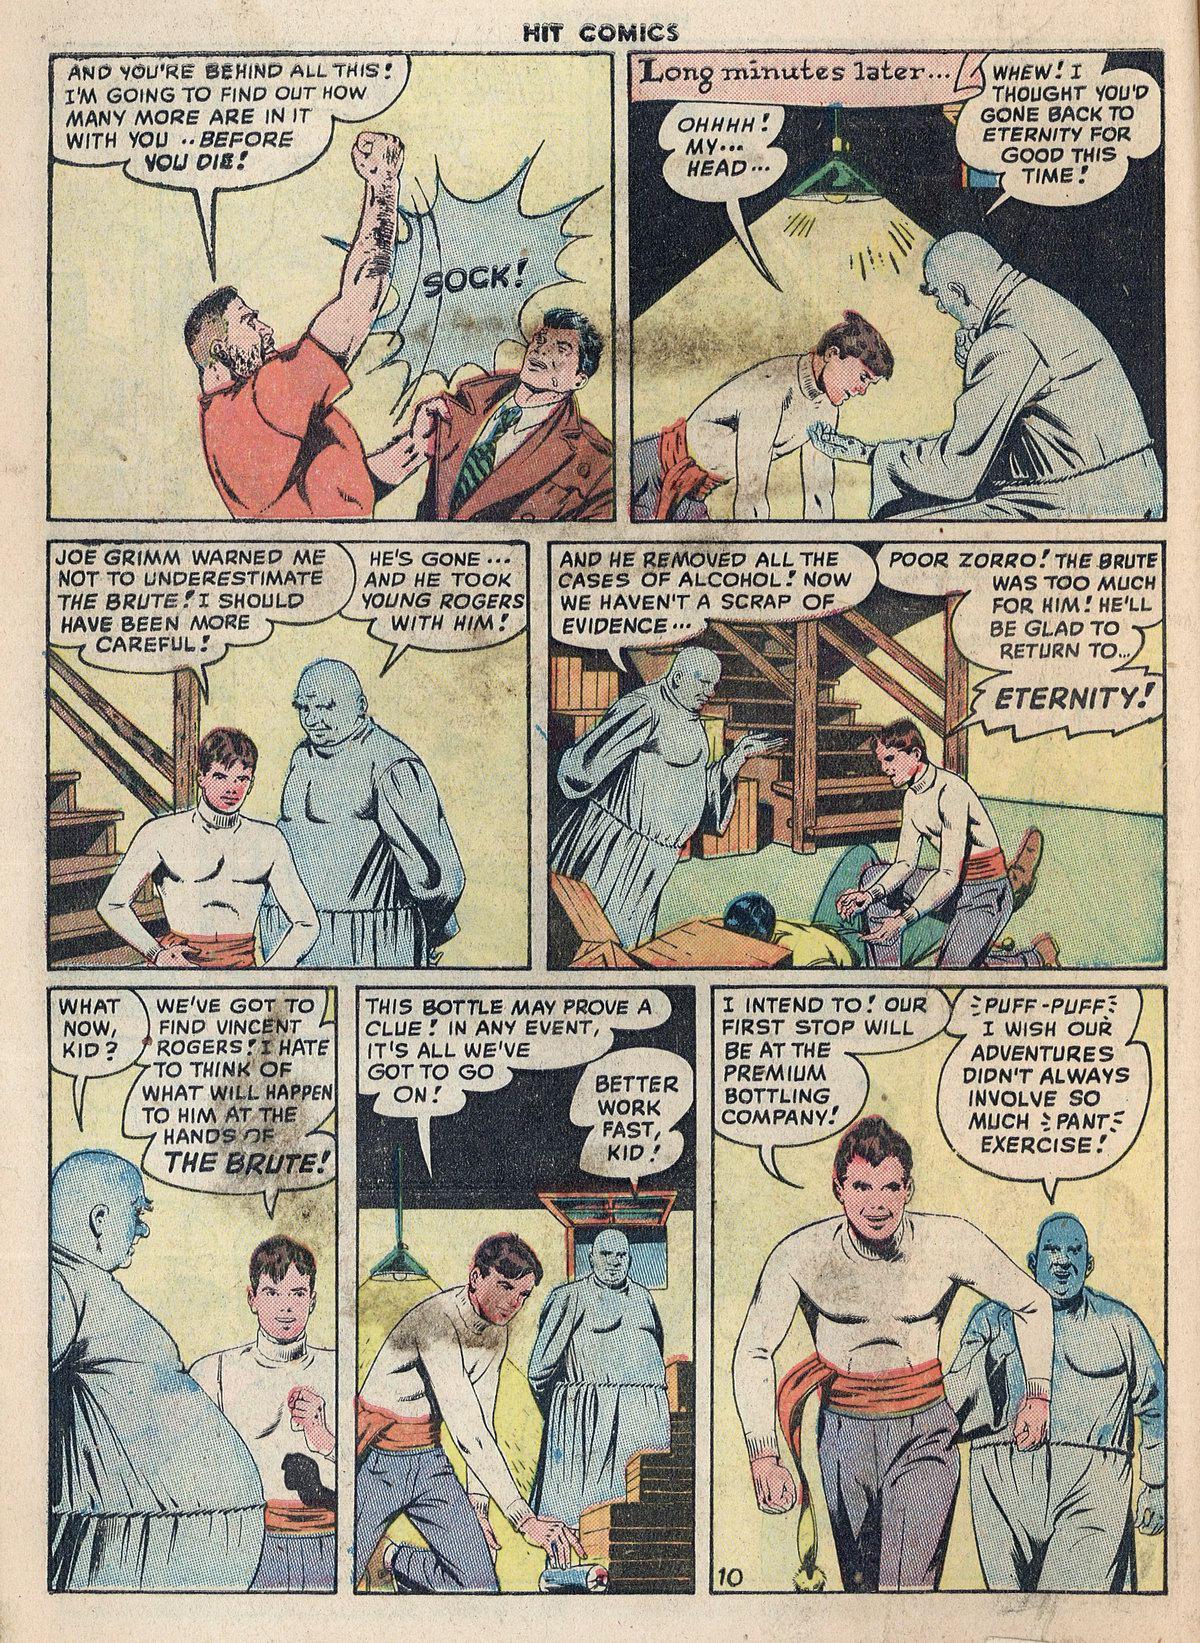 Read online Hit Comics comic -  Issue #55 - 12